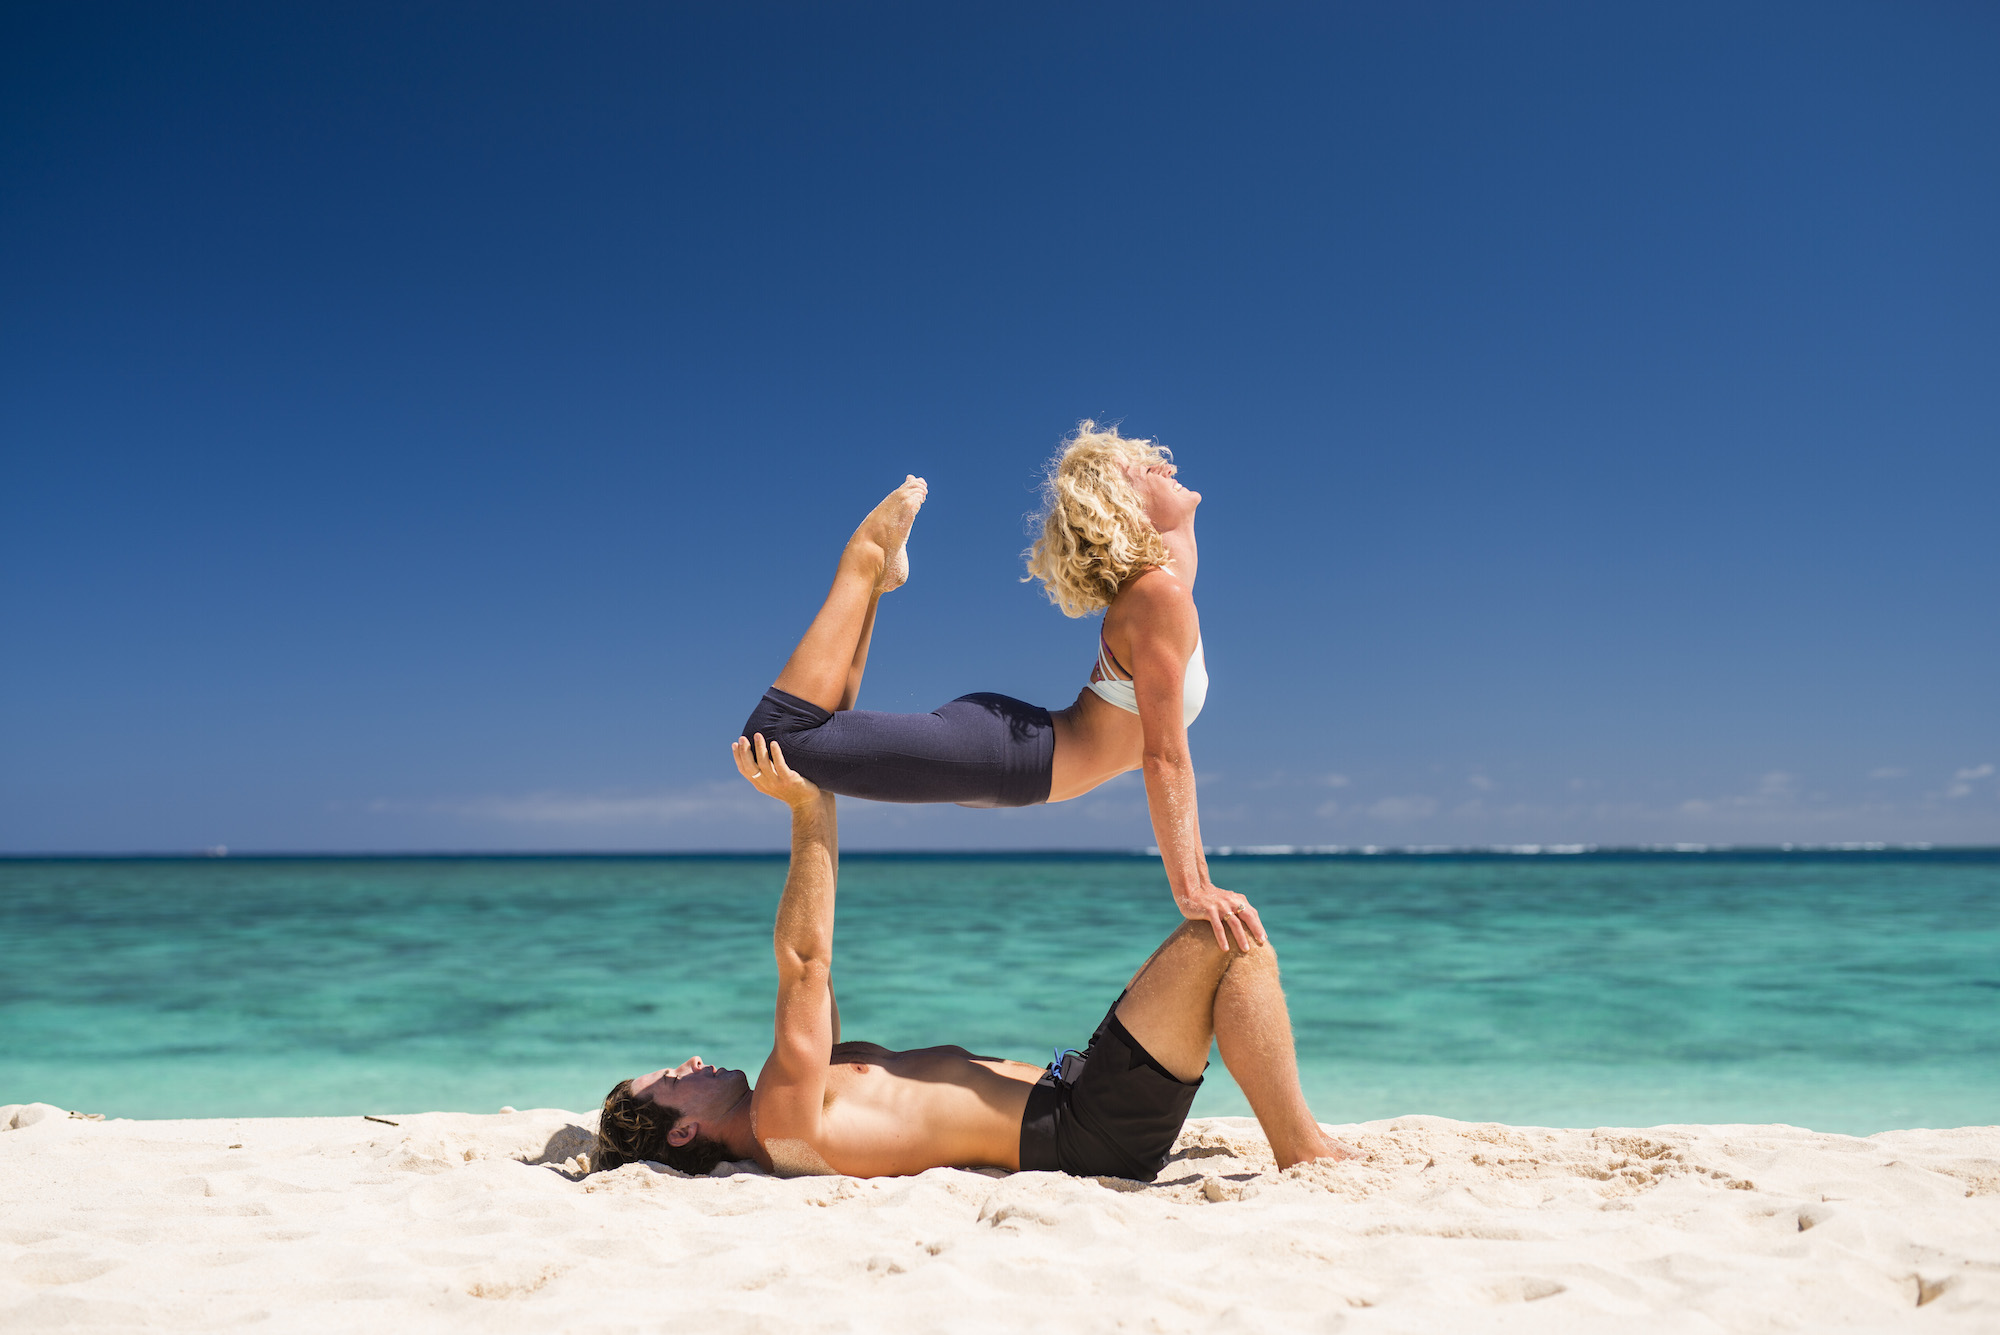 sasha_rory_yoga.jpg